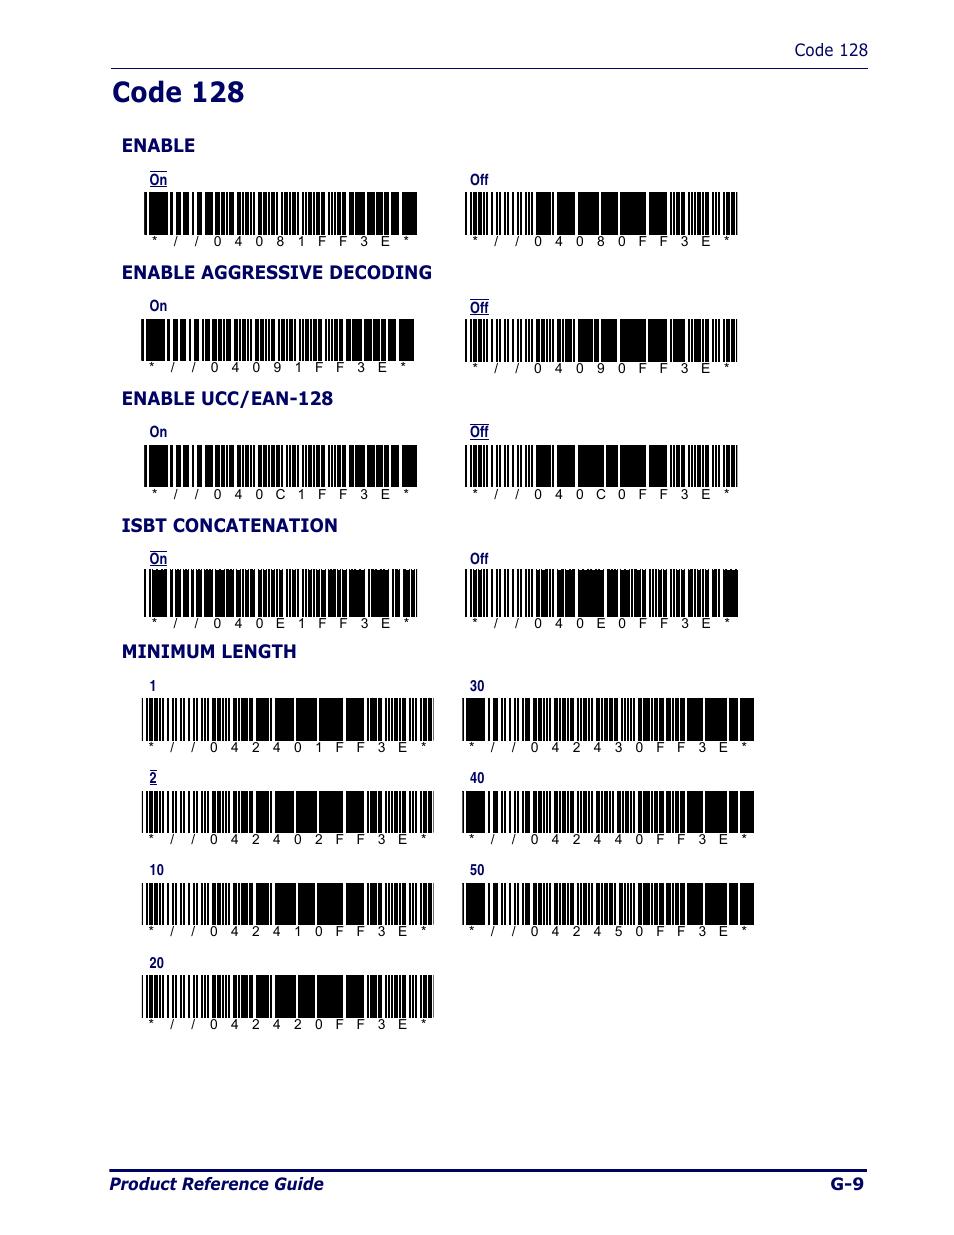 Code 128, Enable, Enable aggressive decoding | Enable ucc/ean-128,